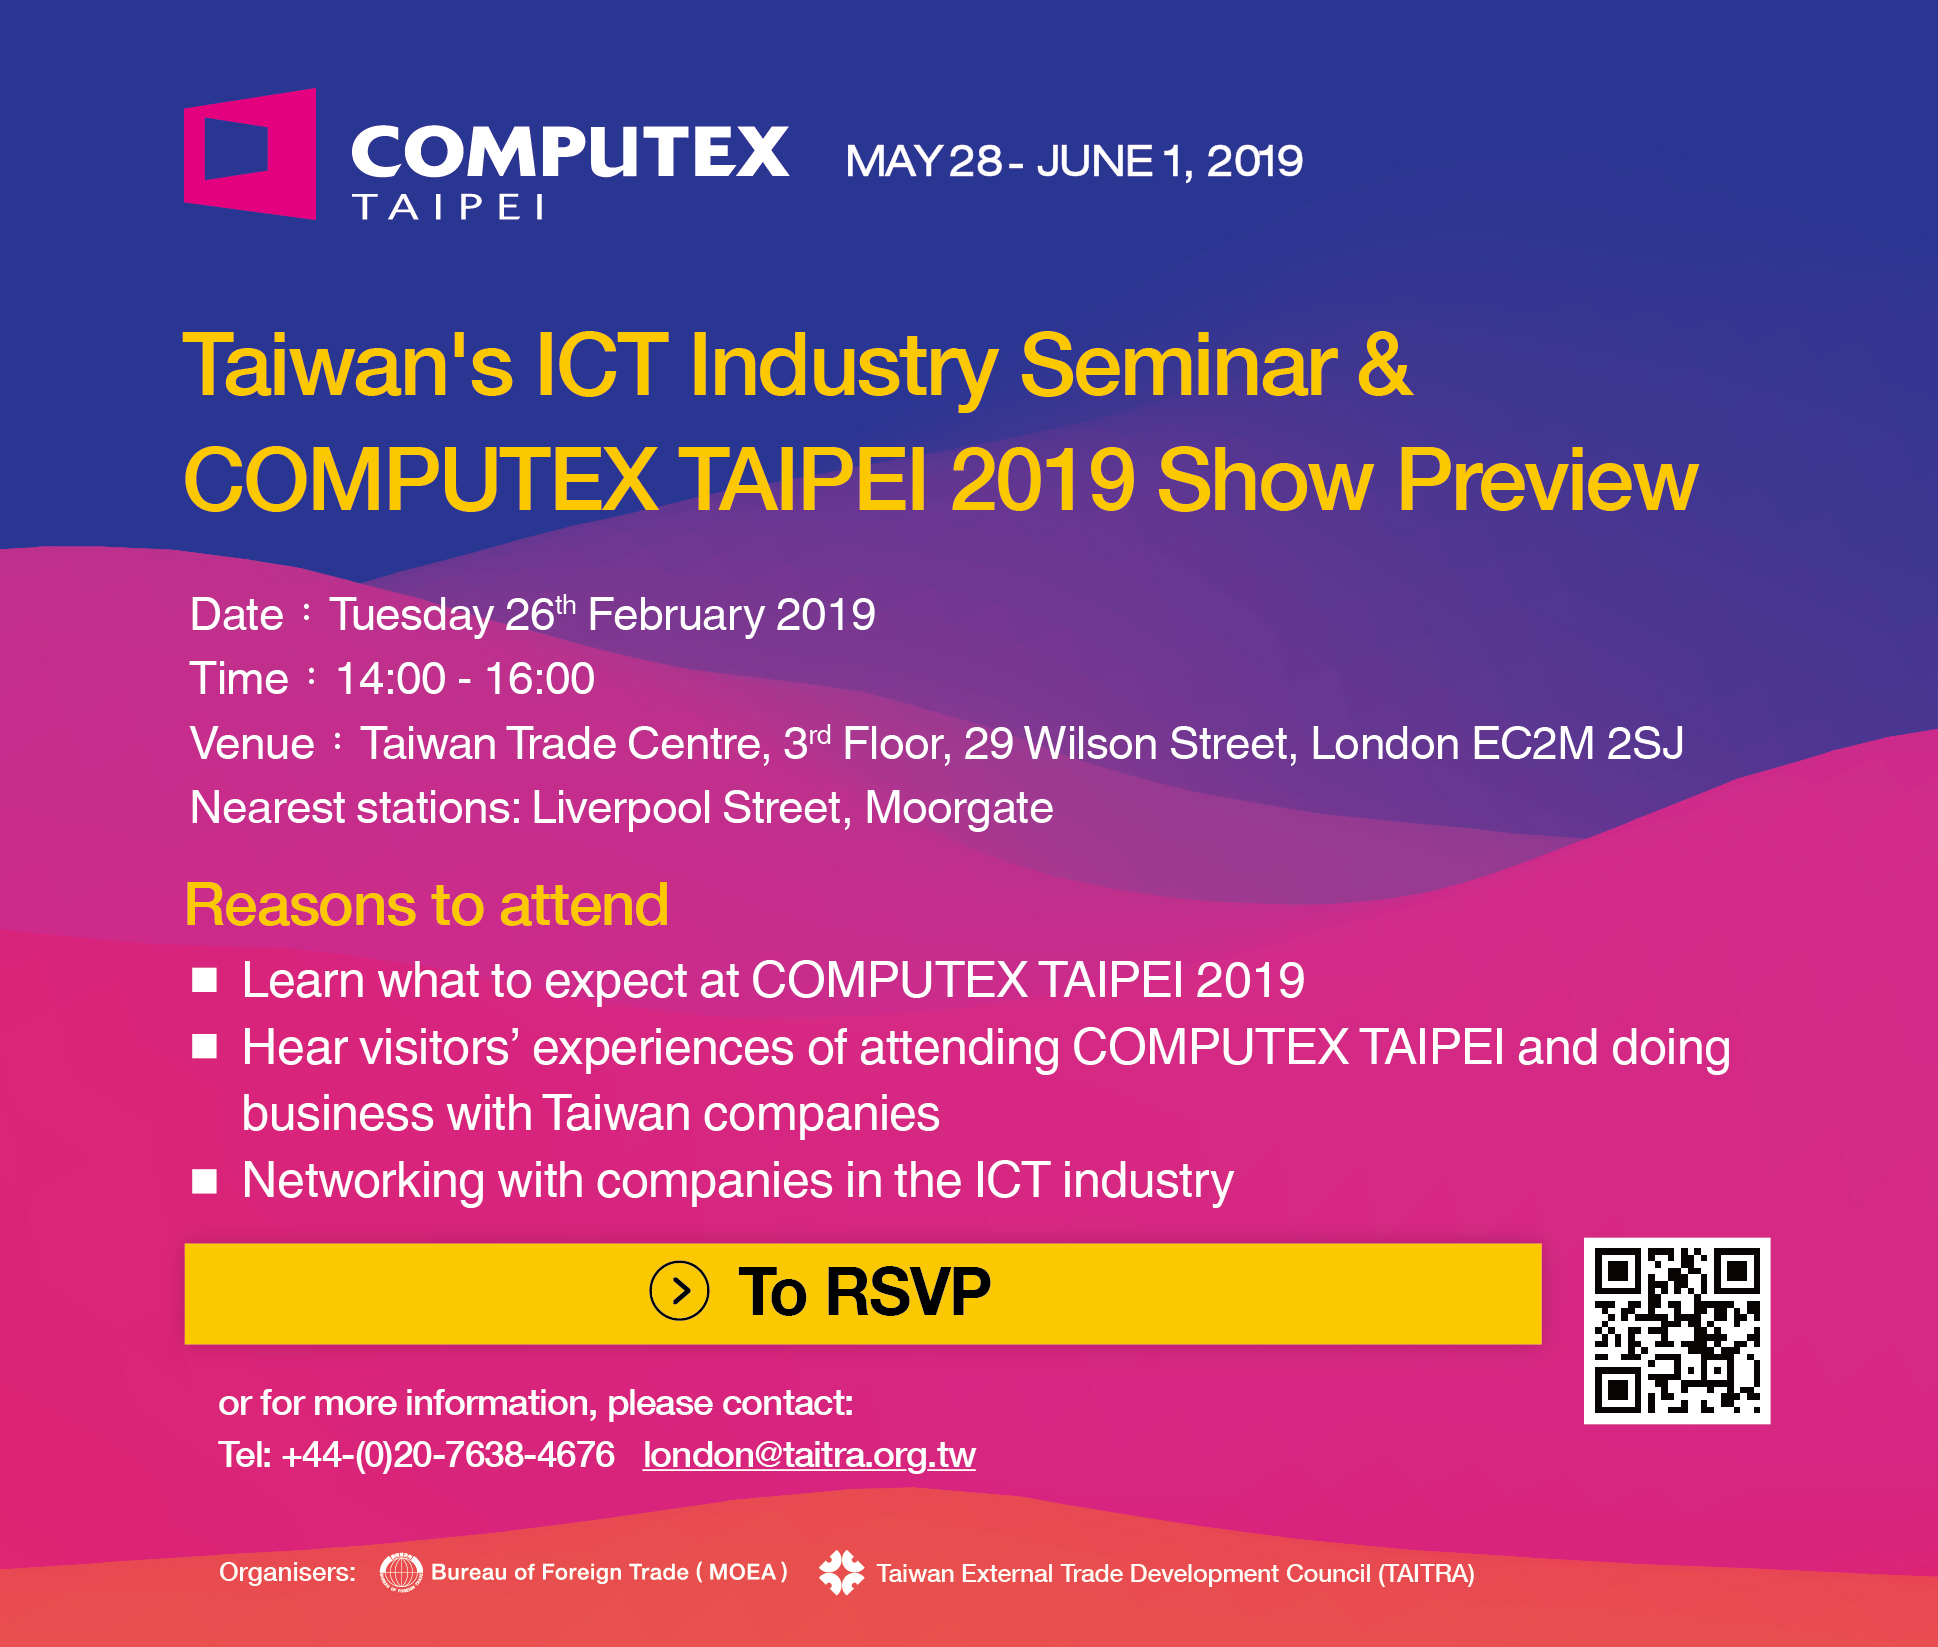 Taiwan Trade Centre London, 倫敦台灣貿易中心 - Taiwan's ICT